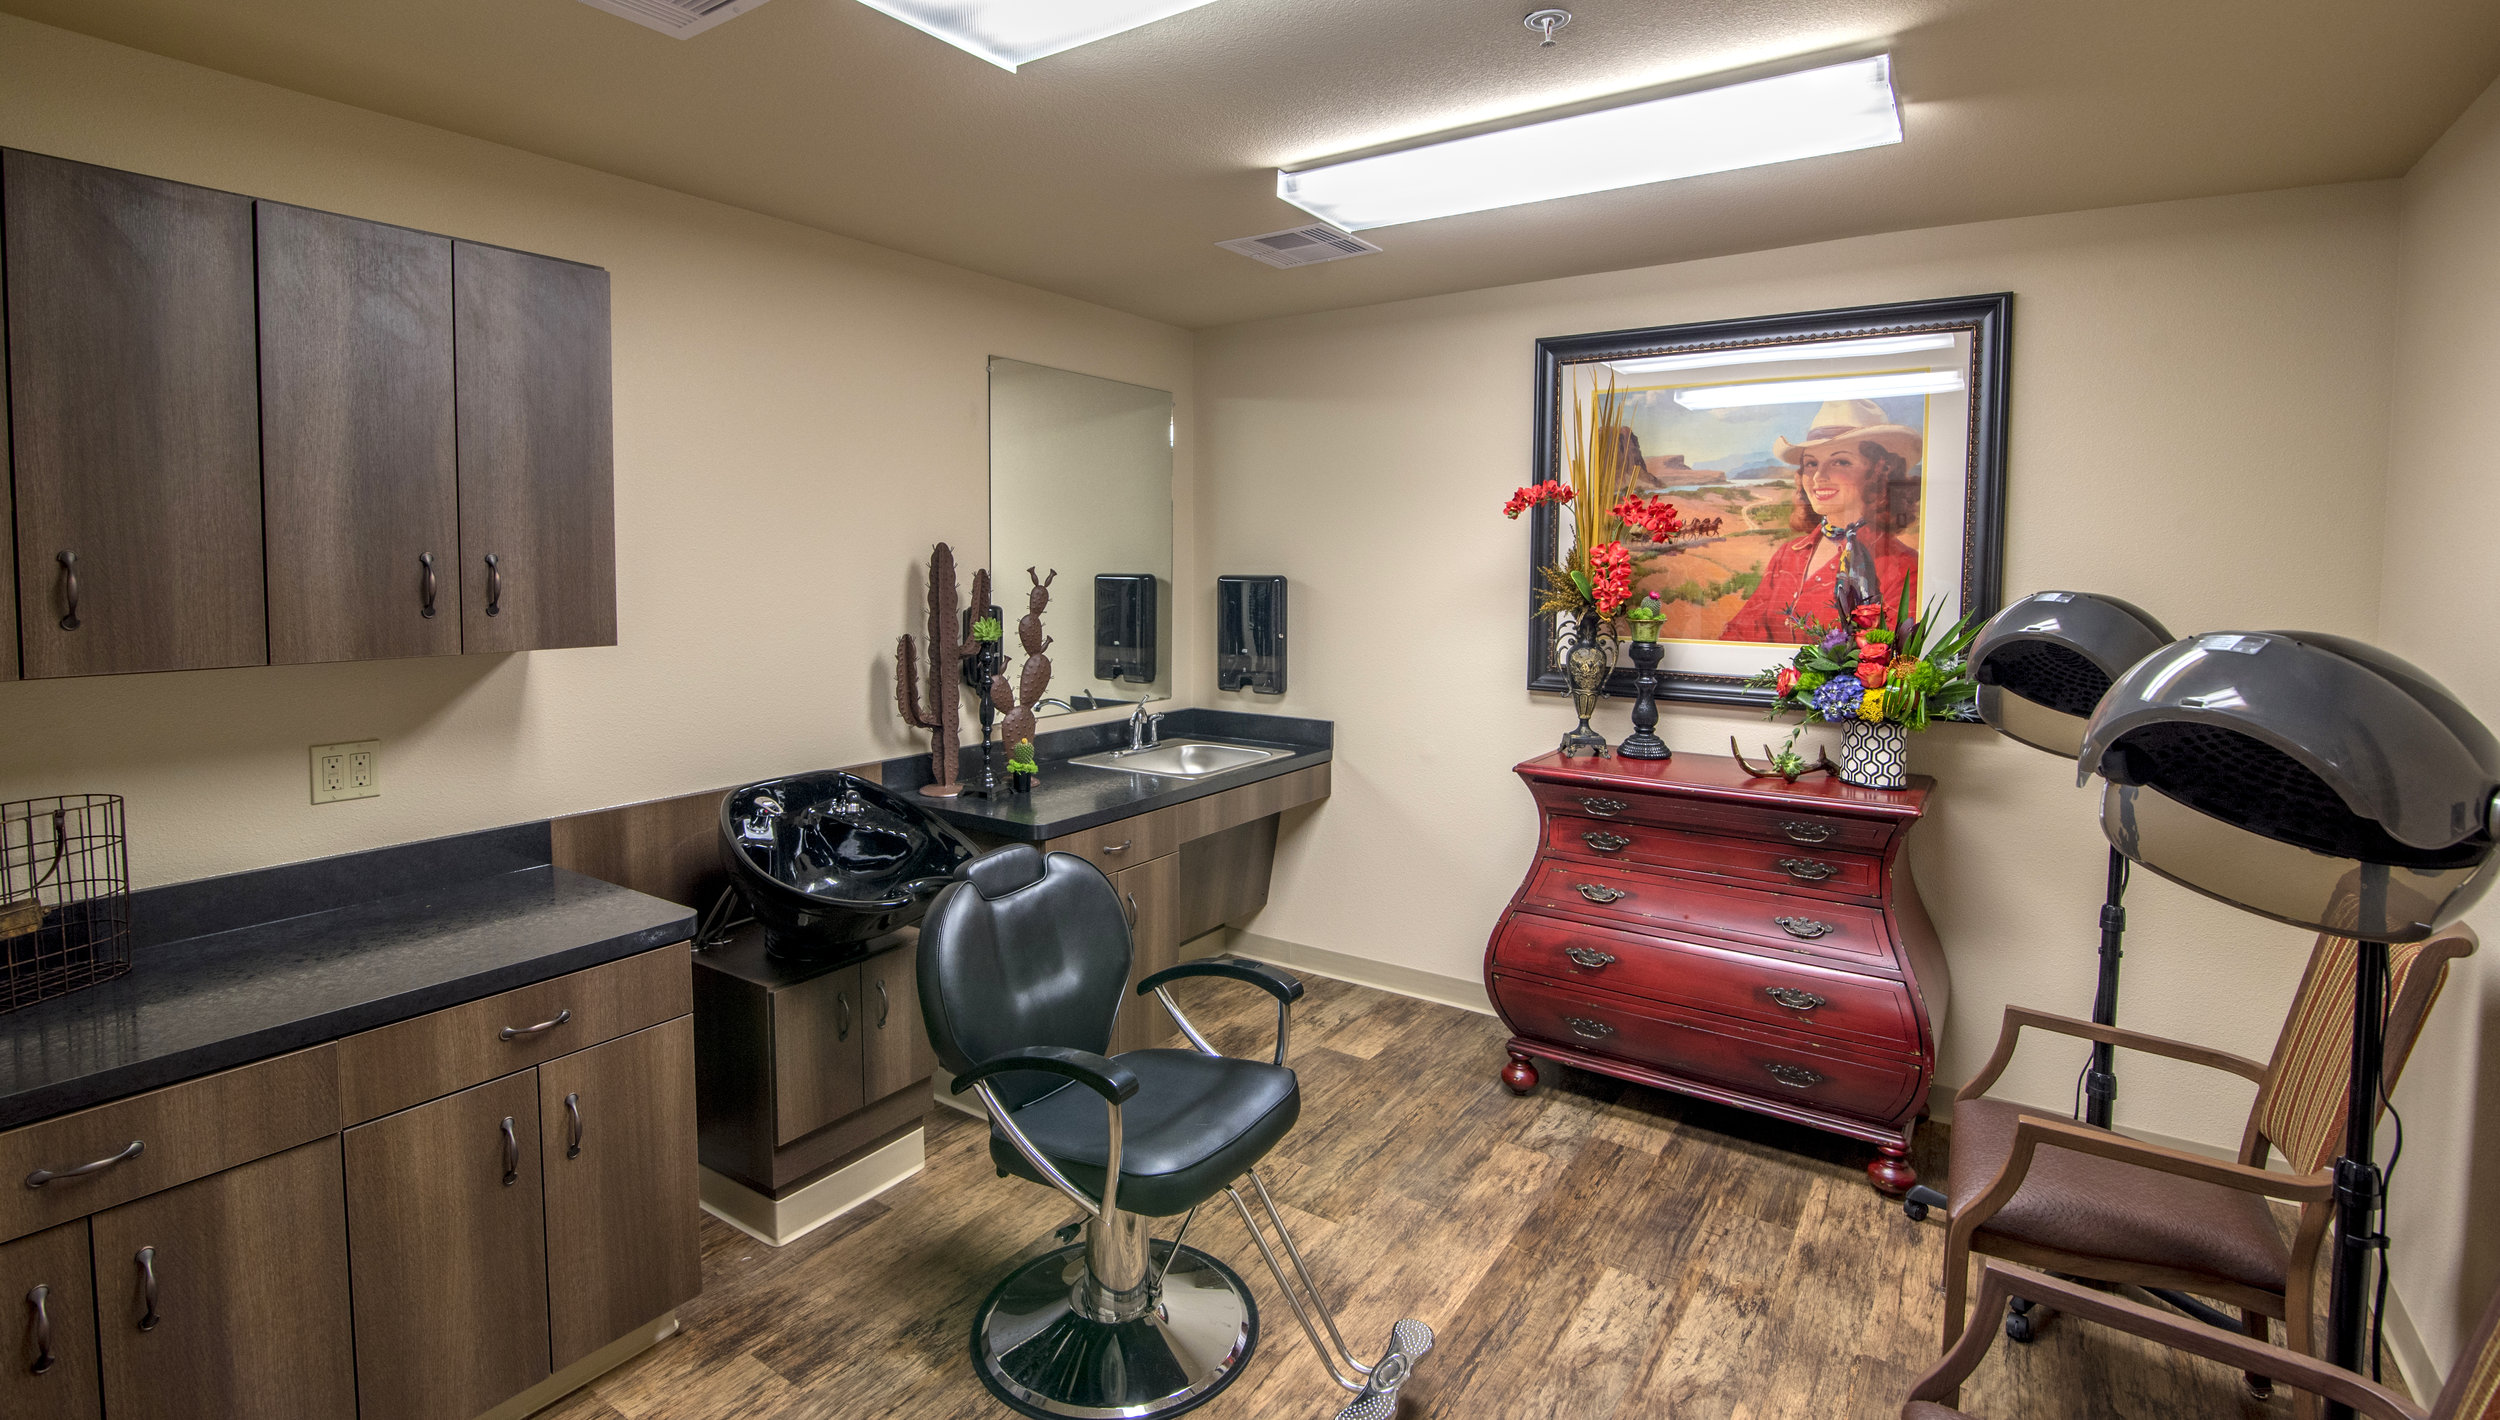 sheridan-wichita-falls-tx-nursing-home-beauty-salon-rehab-amenities .jpg